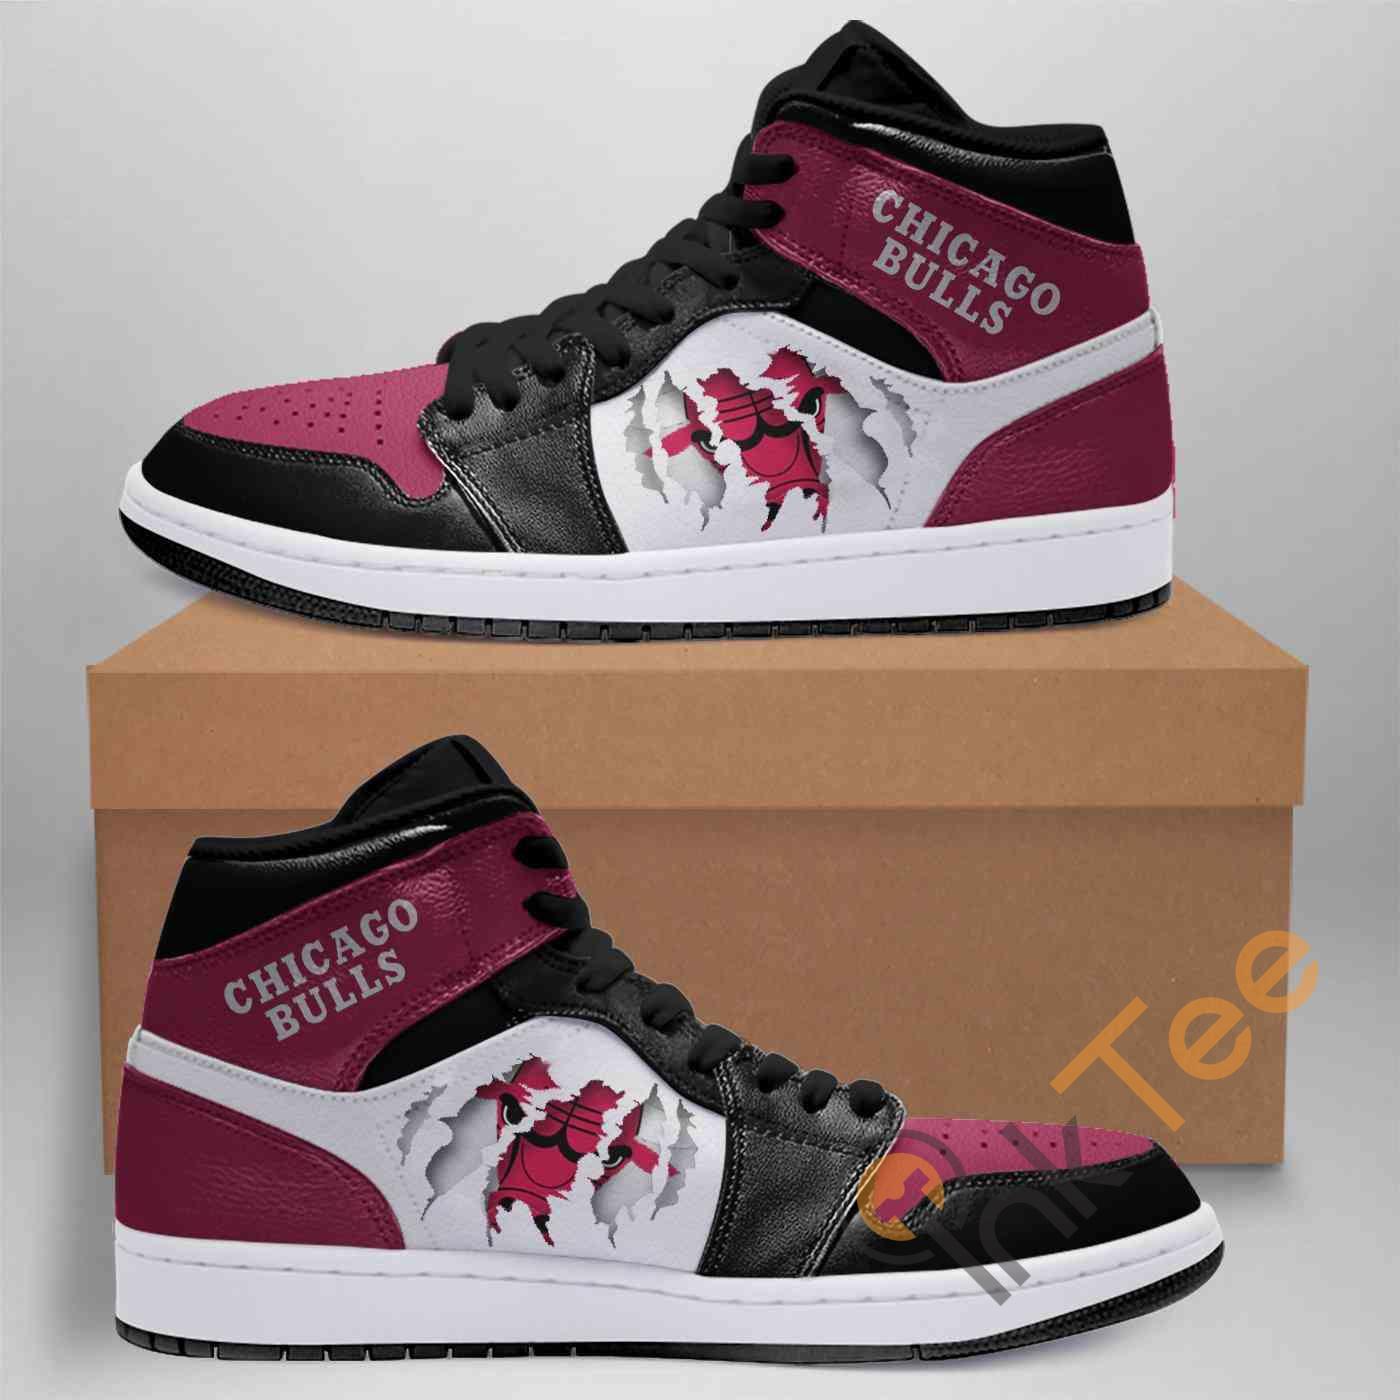 Chicago Bulls Nba Custom Air Jordan Shoes